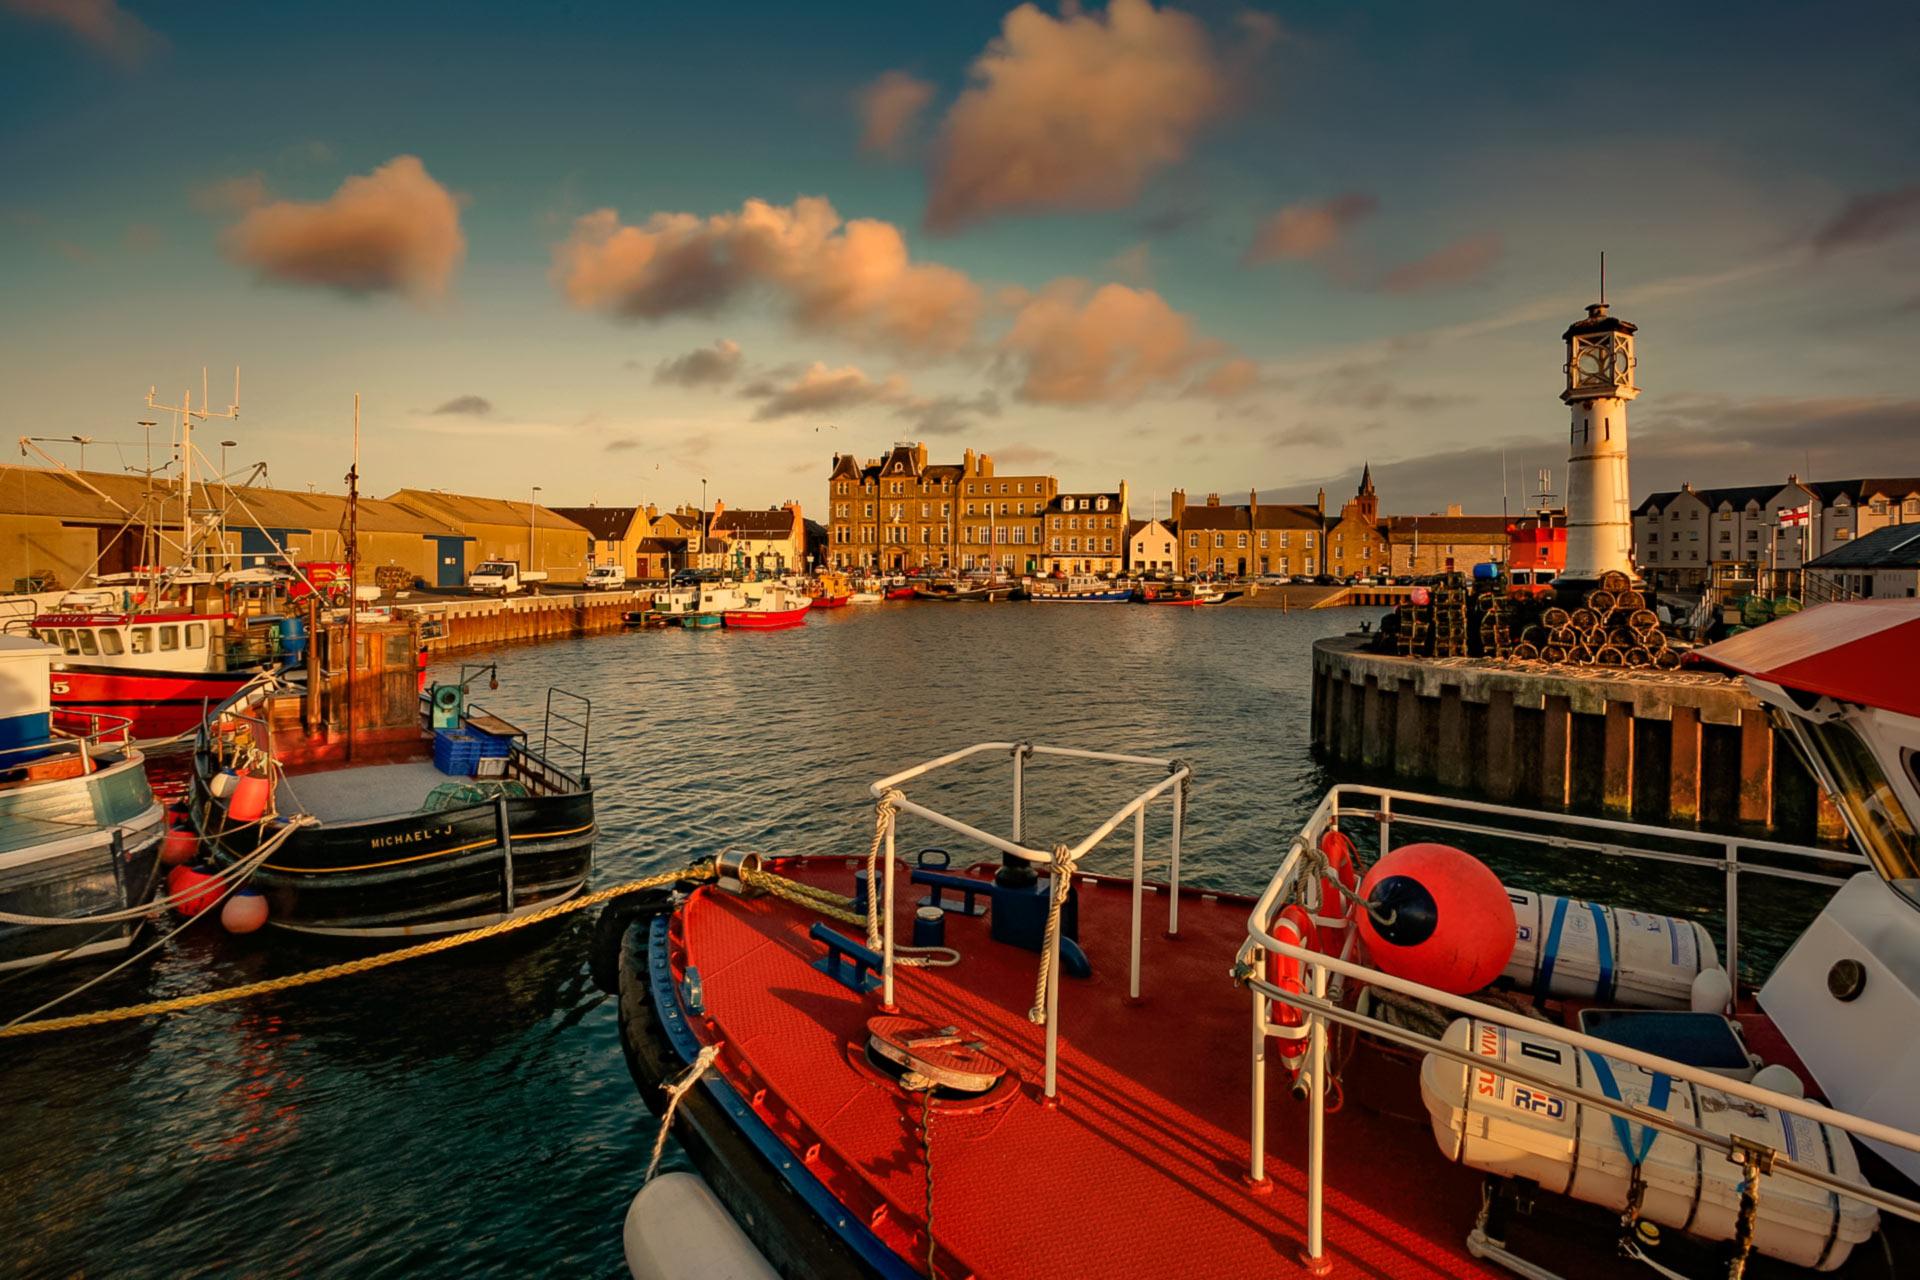 Kirkwall - Accommodation & Things To Do | VisitScotland